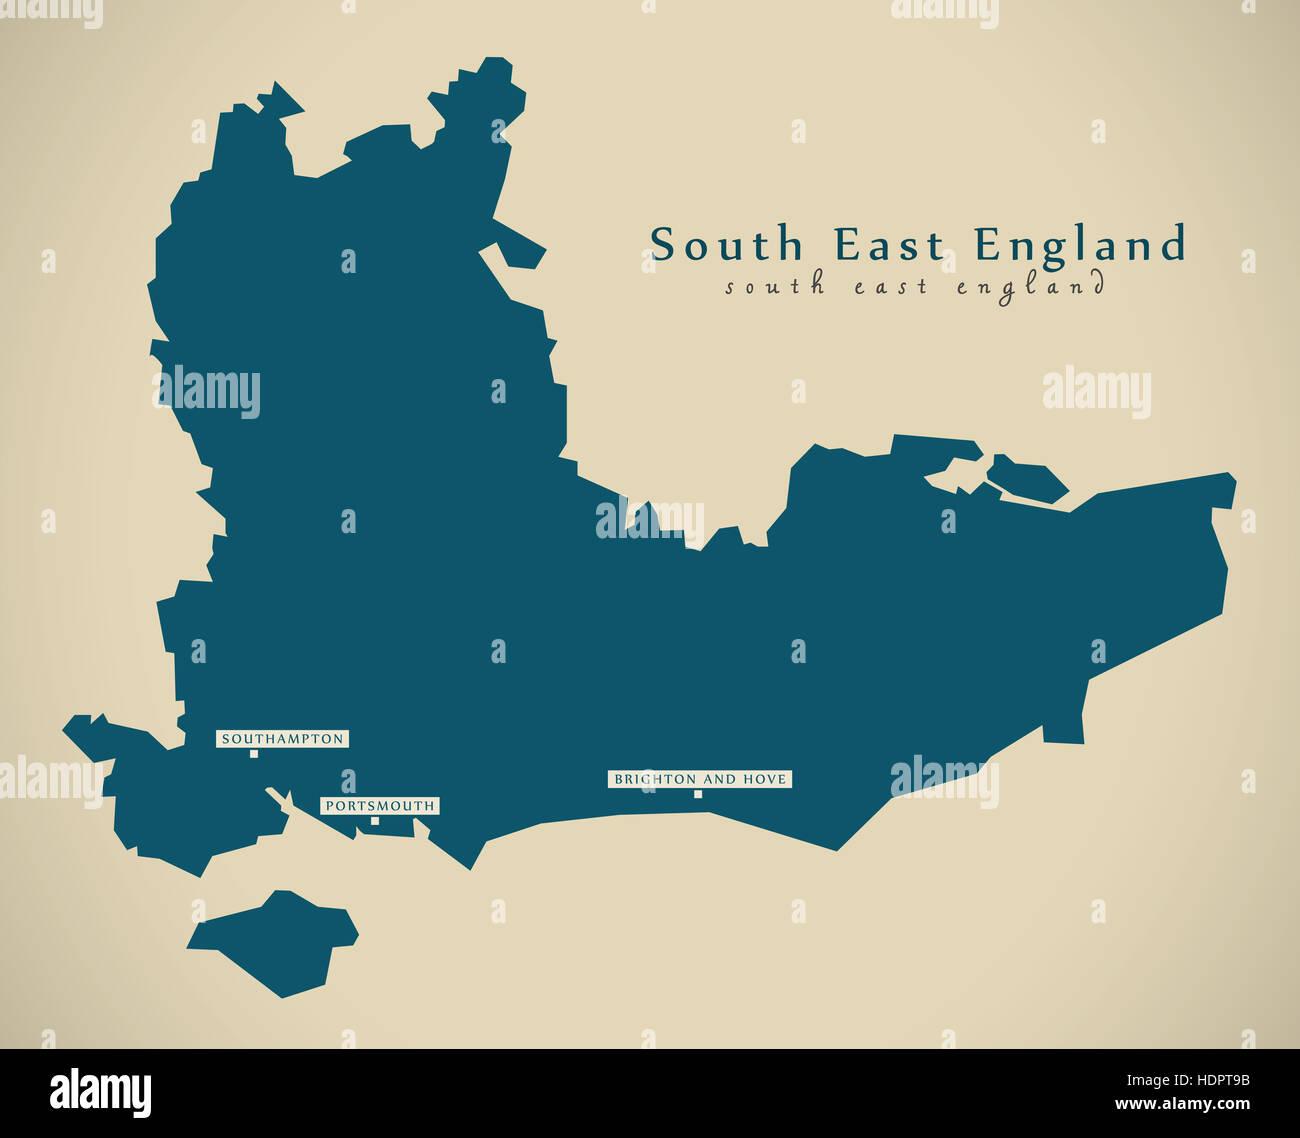 Map Of Southern England Uk.Modern Map South East England Uk Illustration Stock Photo